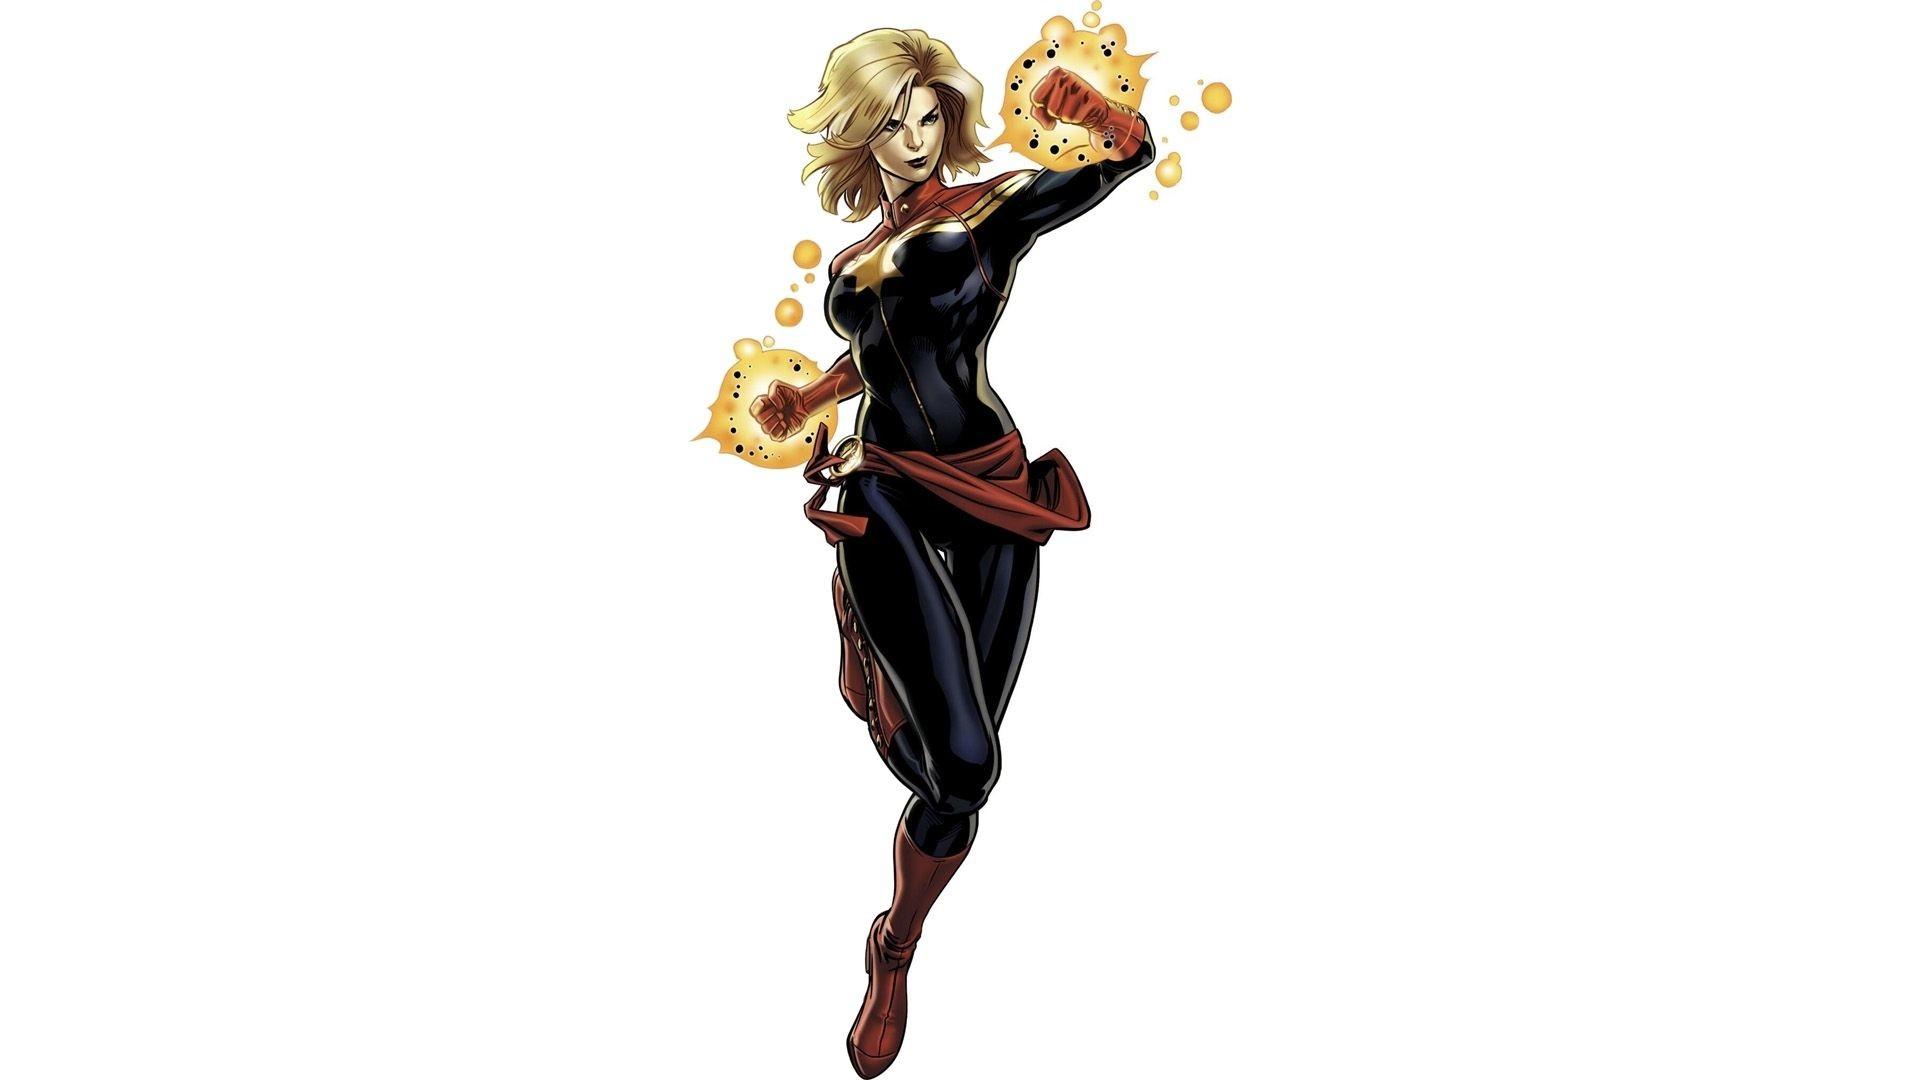 Res: 1920x1080, danvers captain marvel, ms. marvel, carol danvers, comics wallpapers